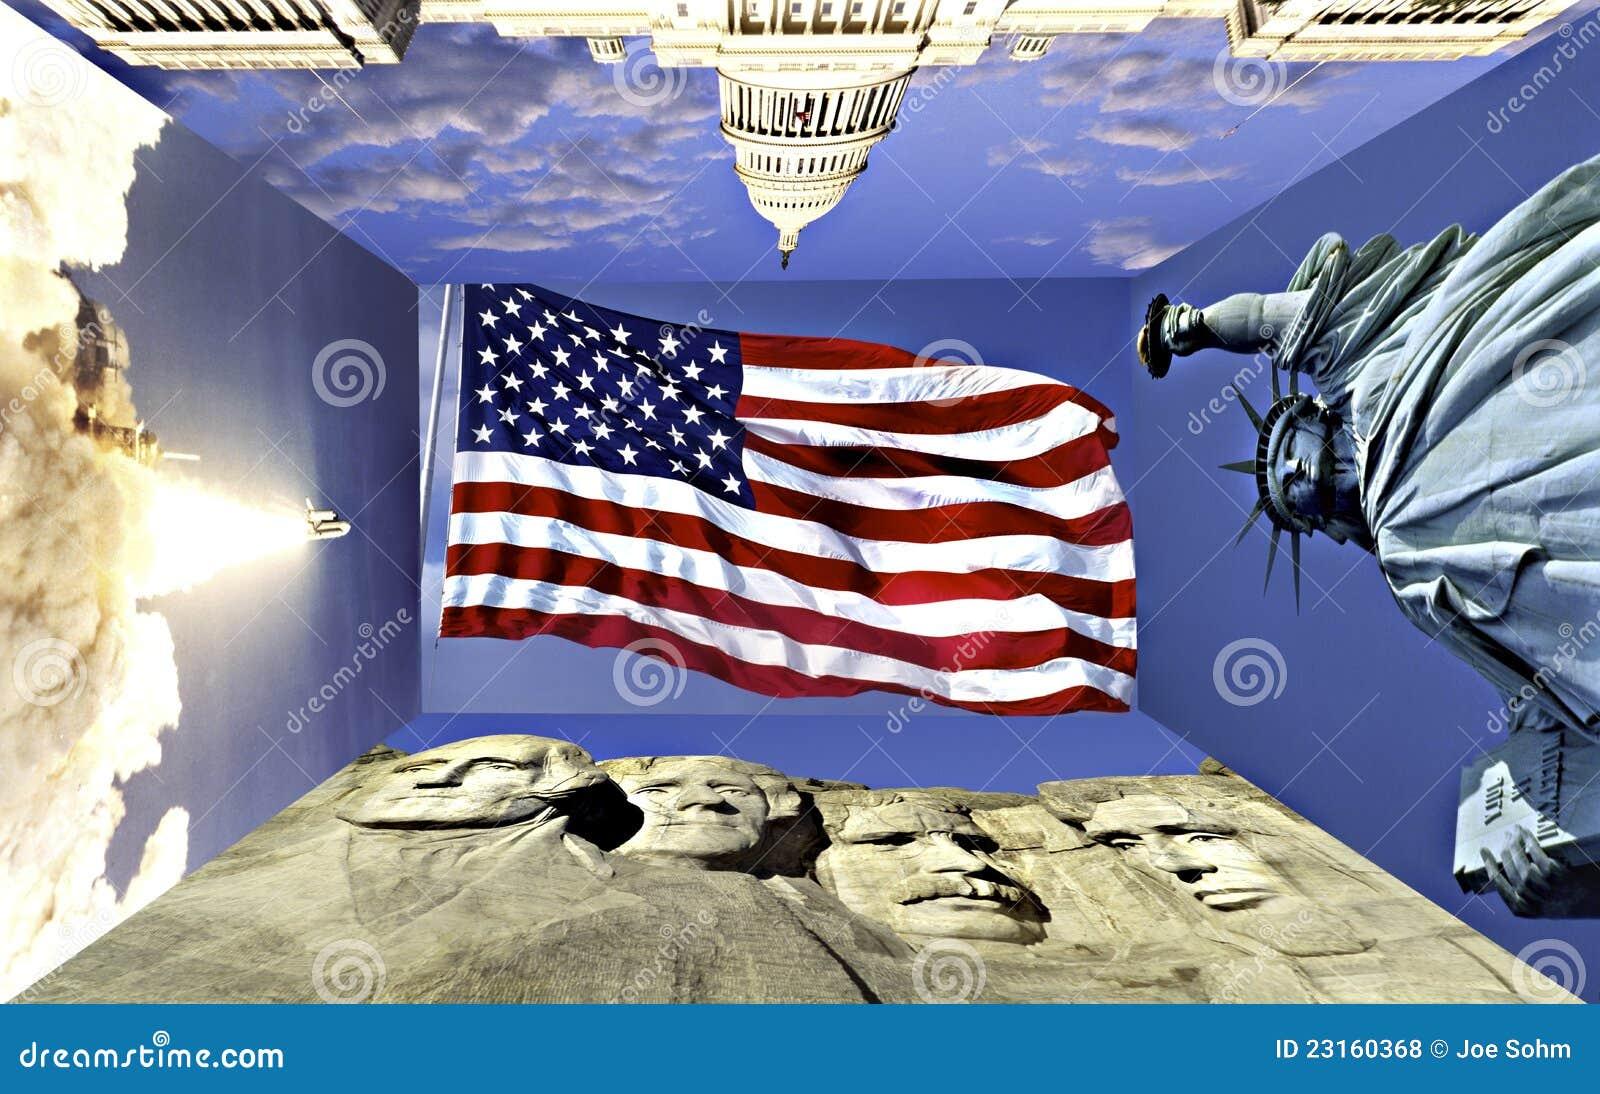 patriotism extended definition essay